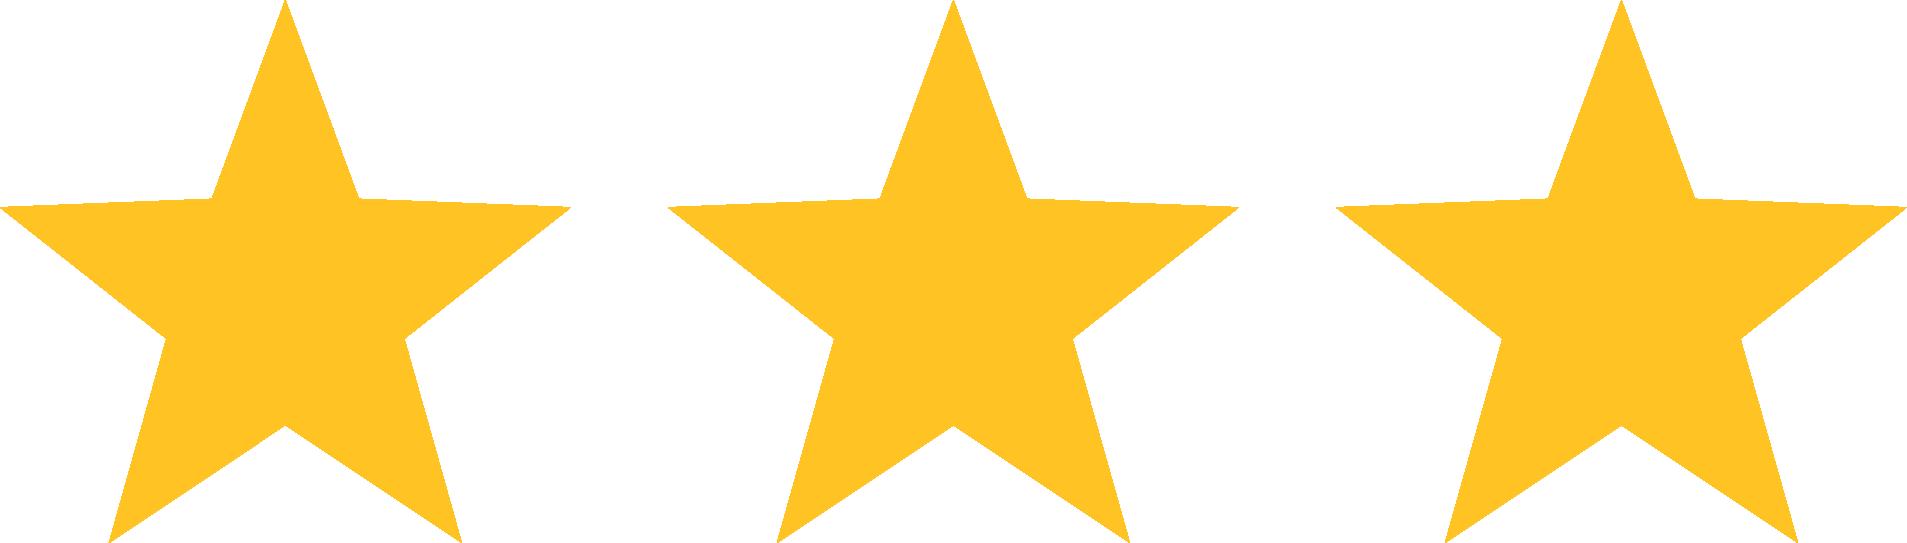 3 Star Vector